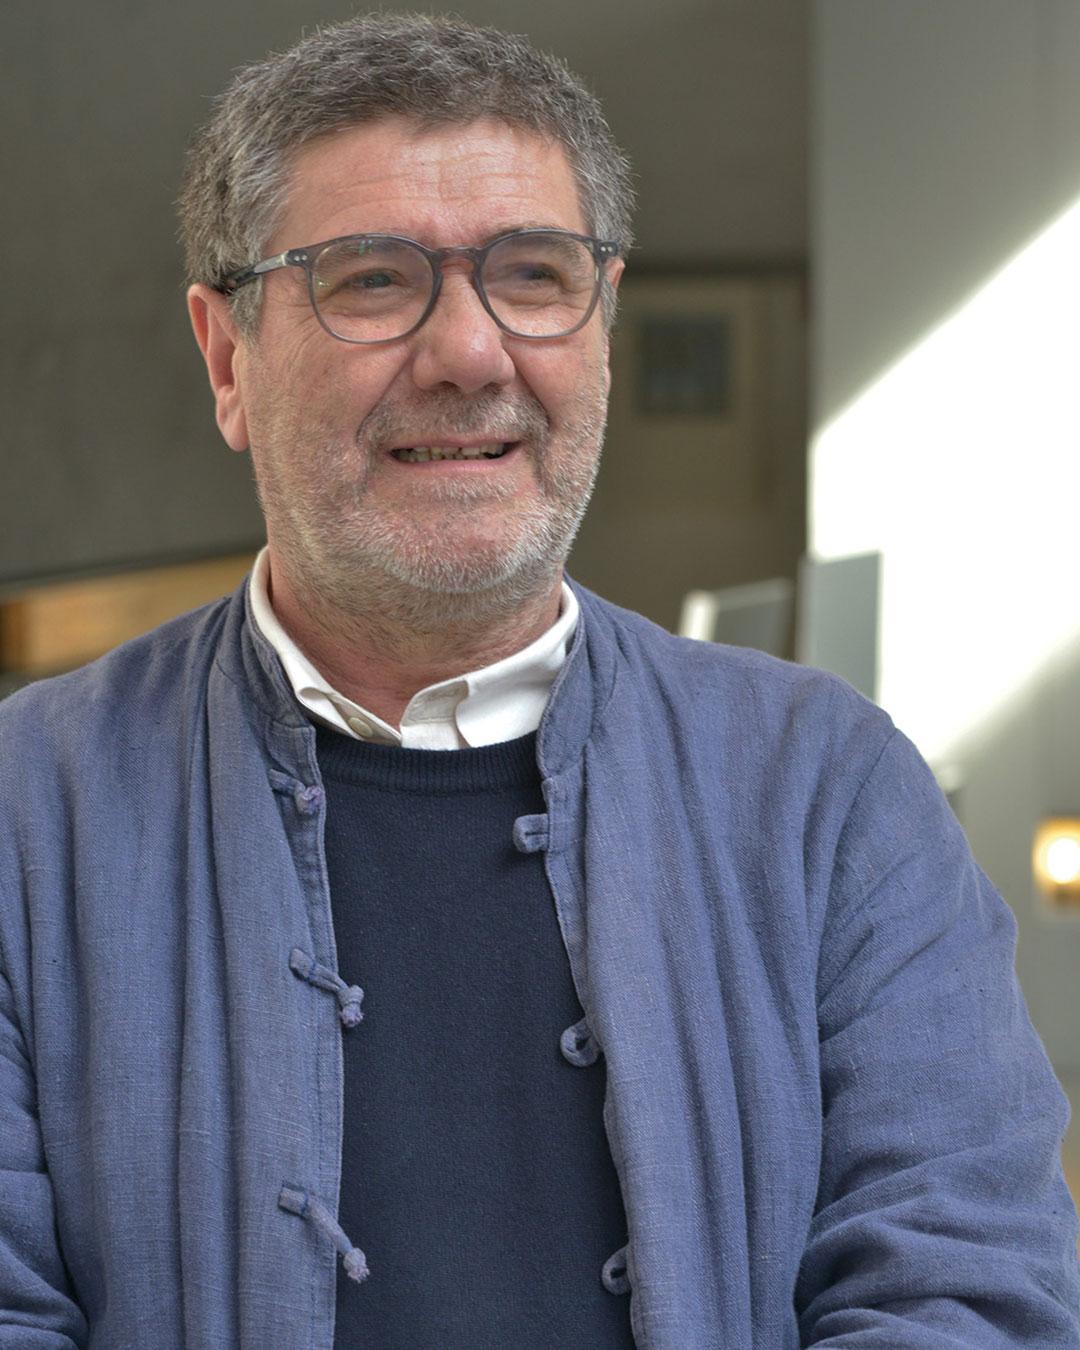 Graziano Visintin, 2017